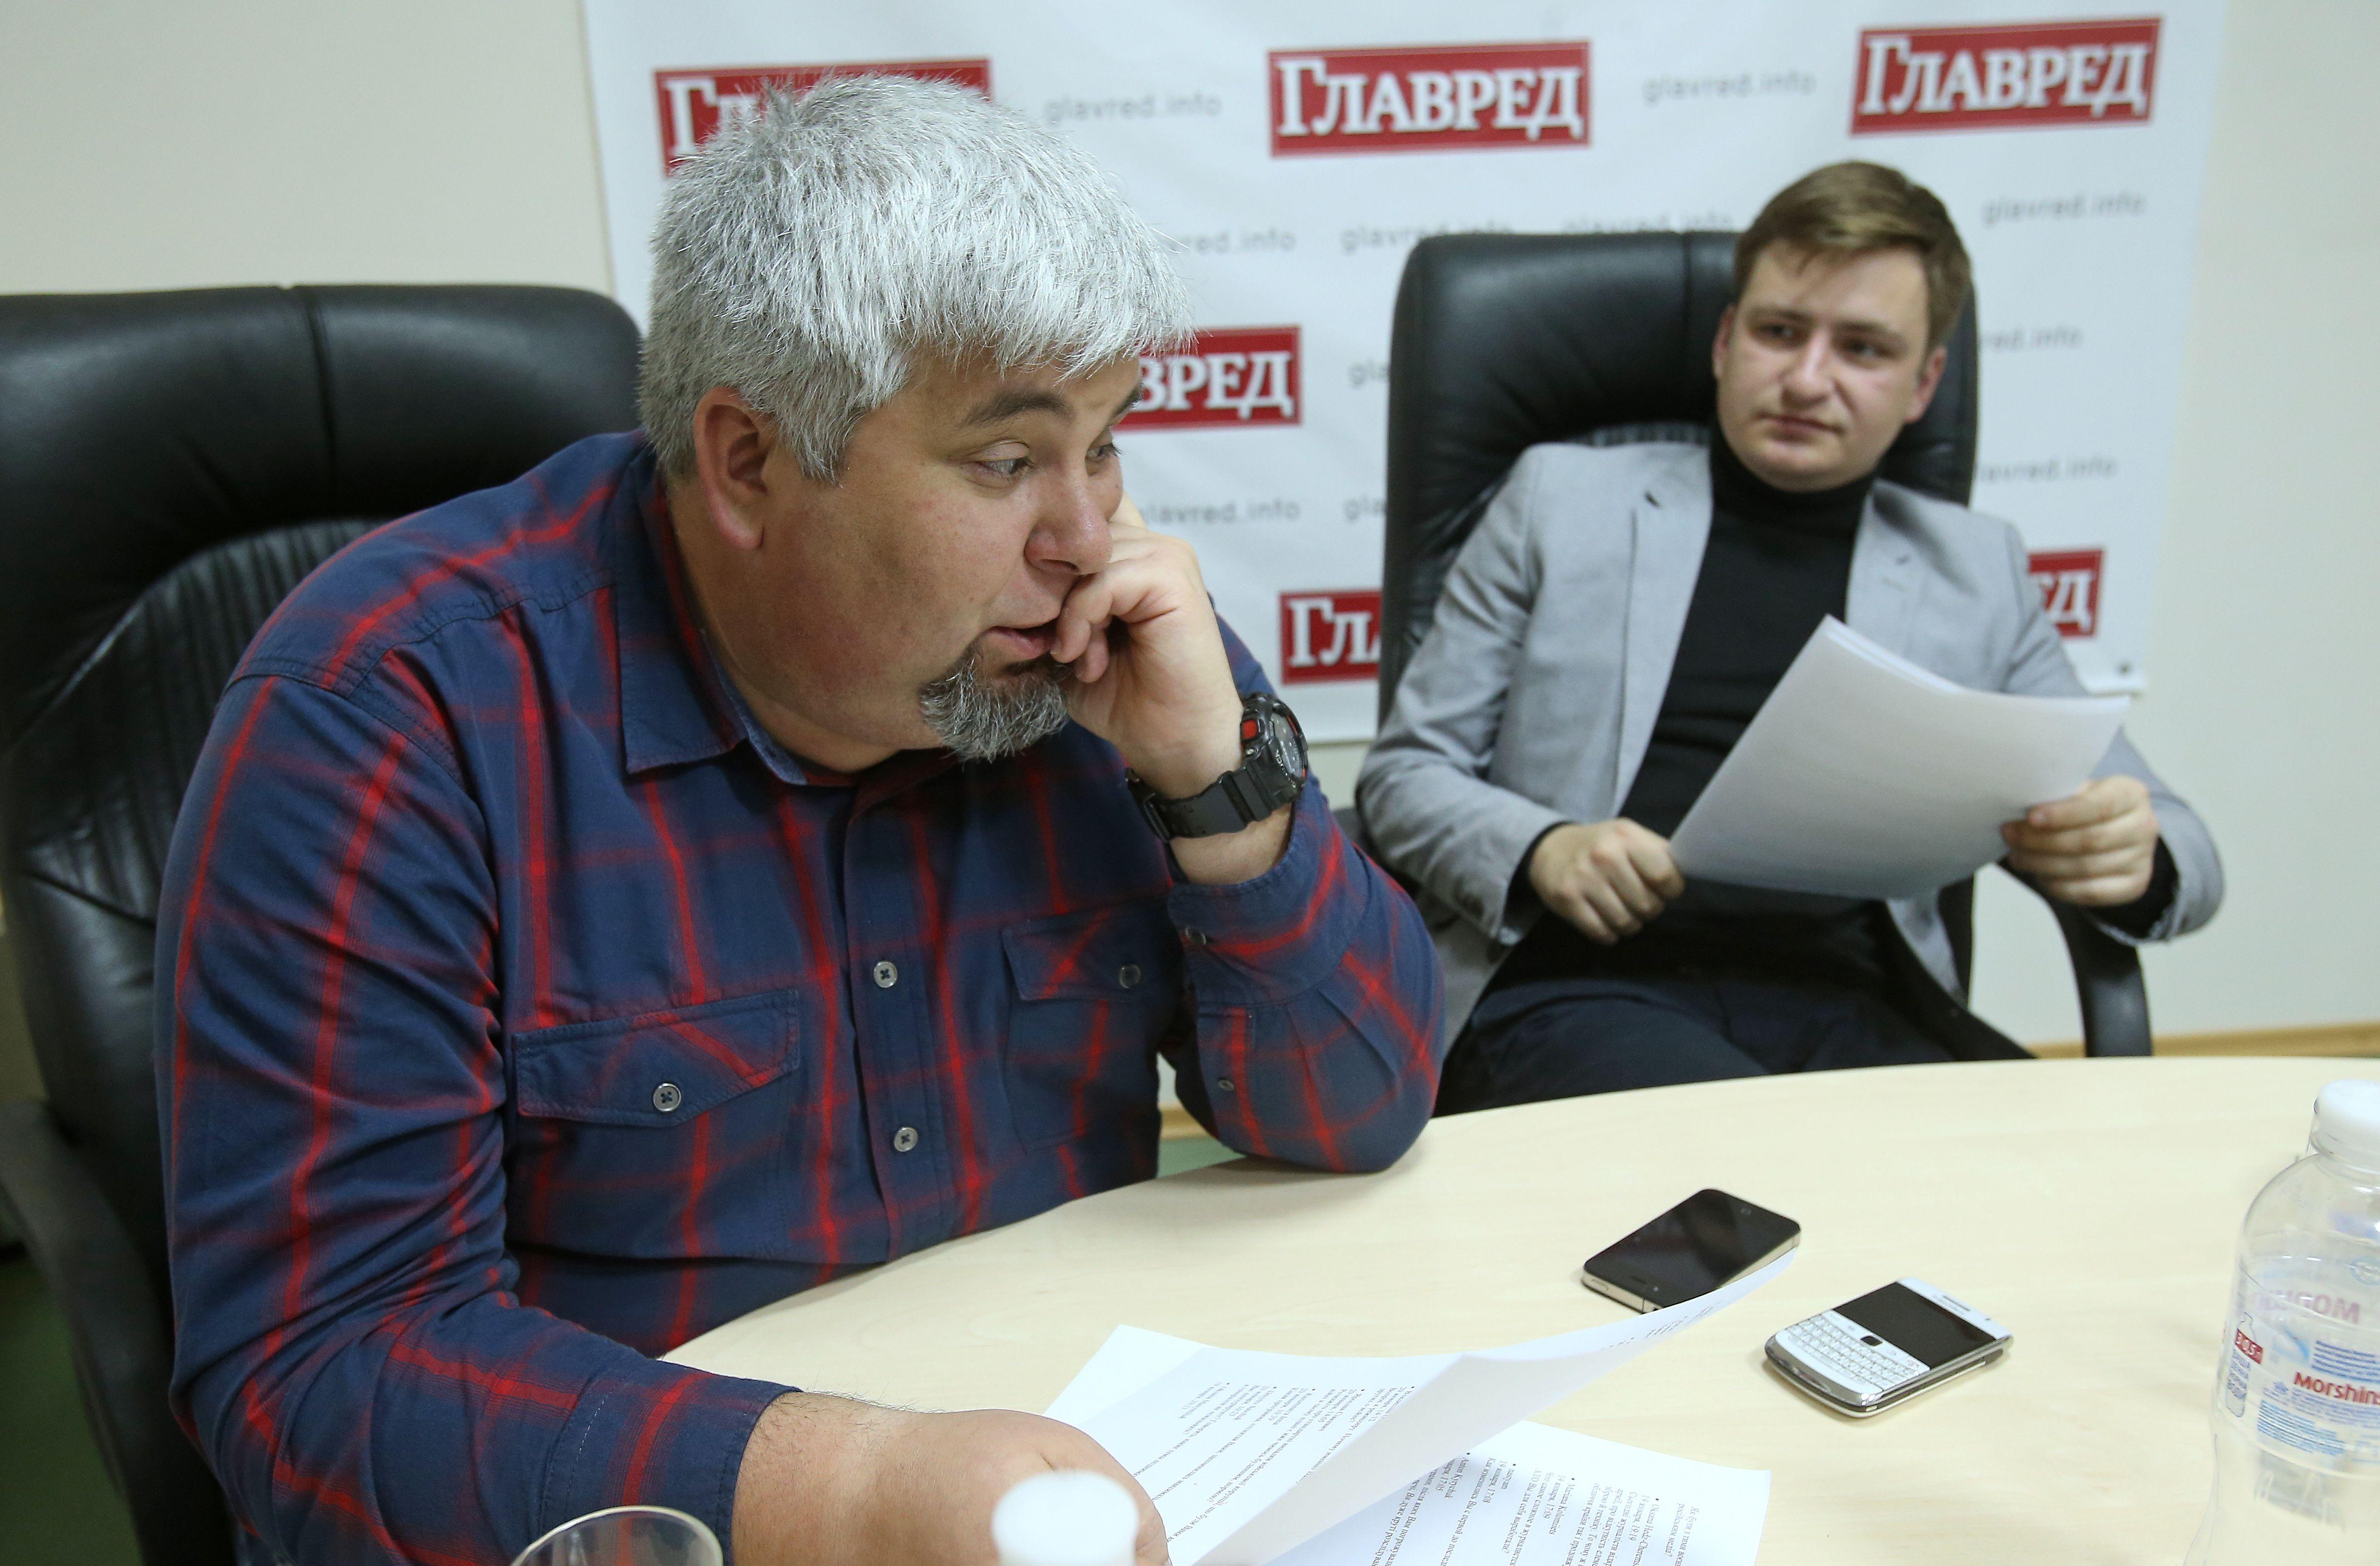 Іван Магда та Андрій Стельмах